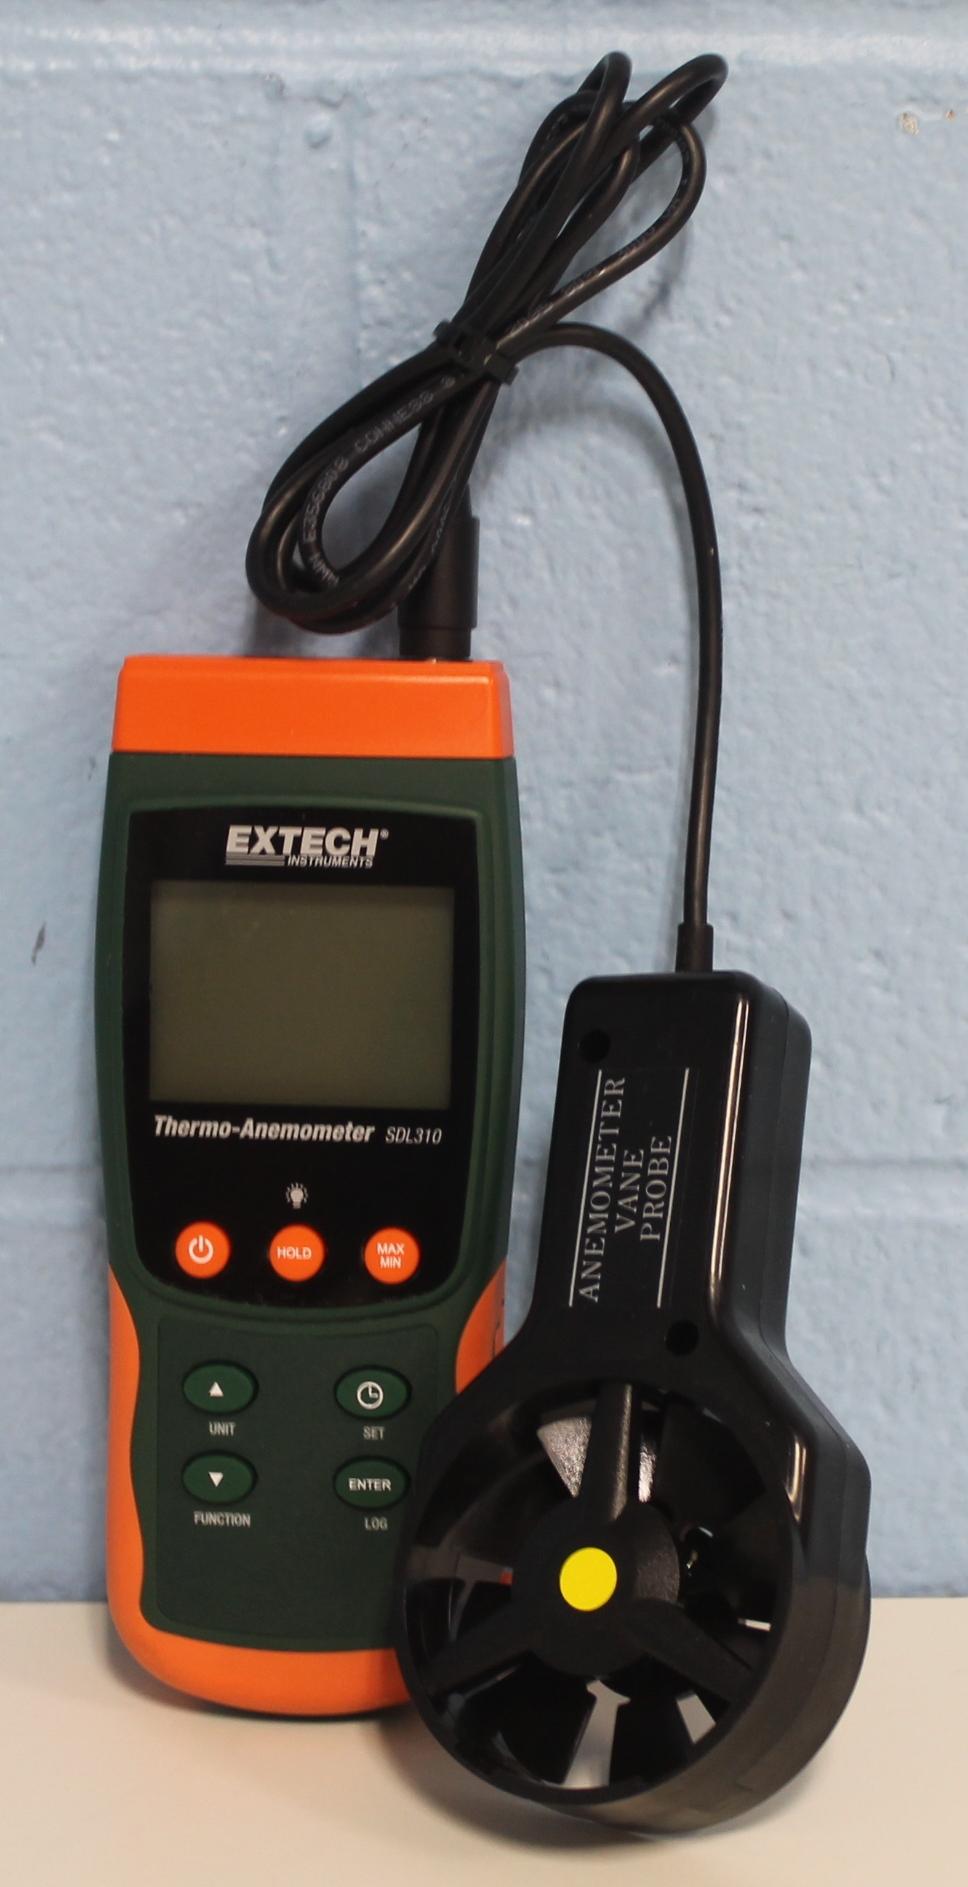 Extech Instruments SDL310 Data Logging Vane Thermoanemometer Image